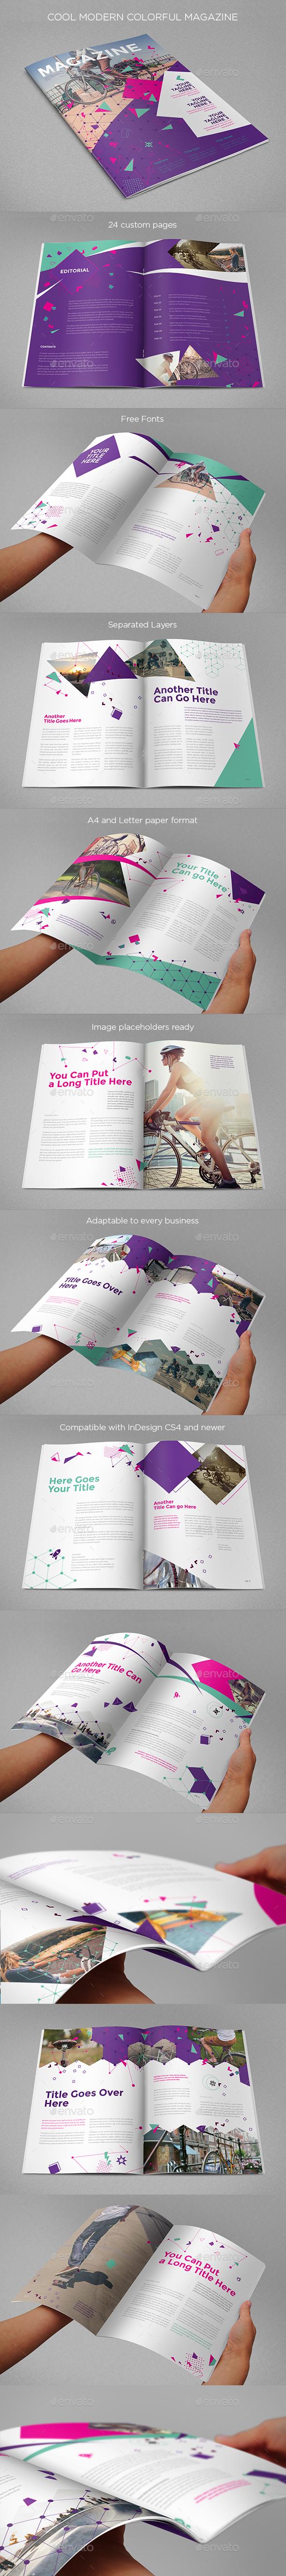 Cool Modern Colorful Magazine - Magazines Print Templates